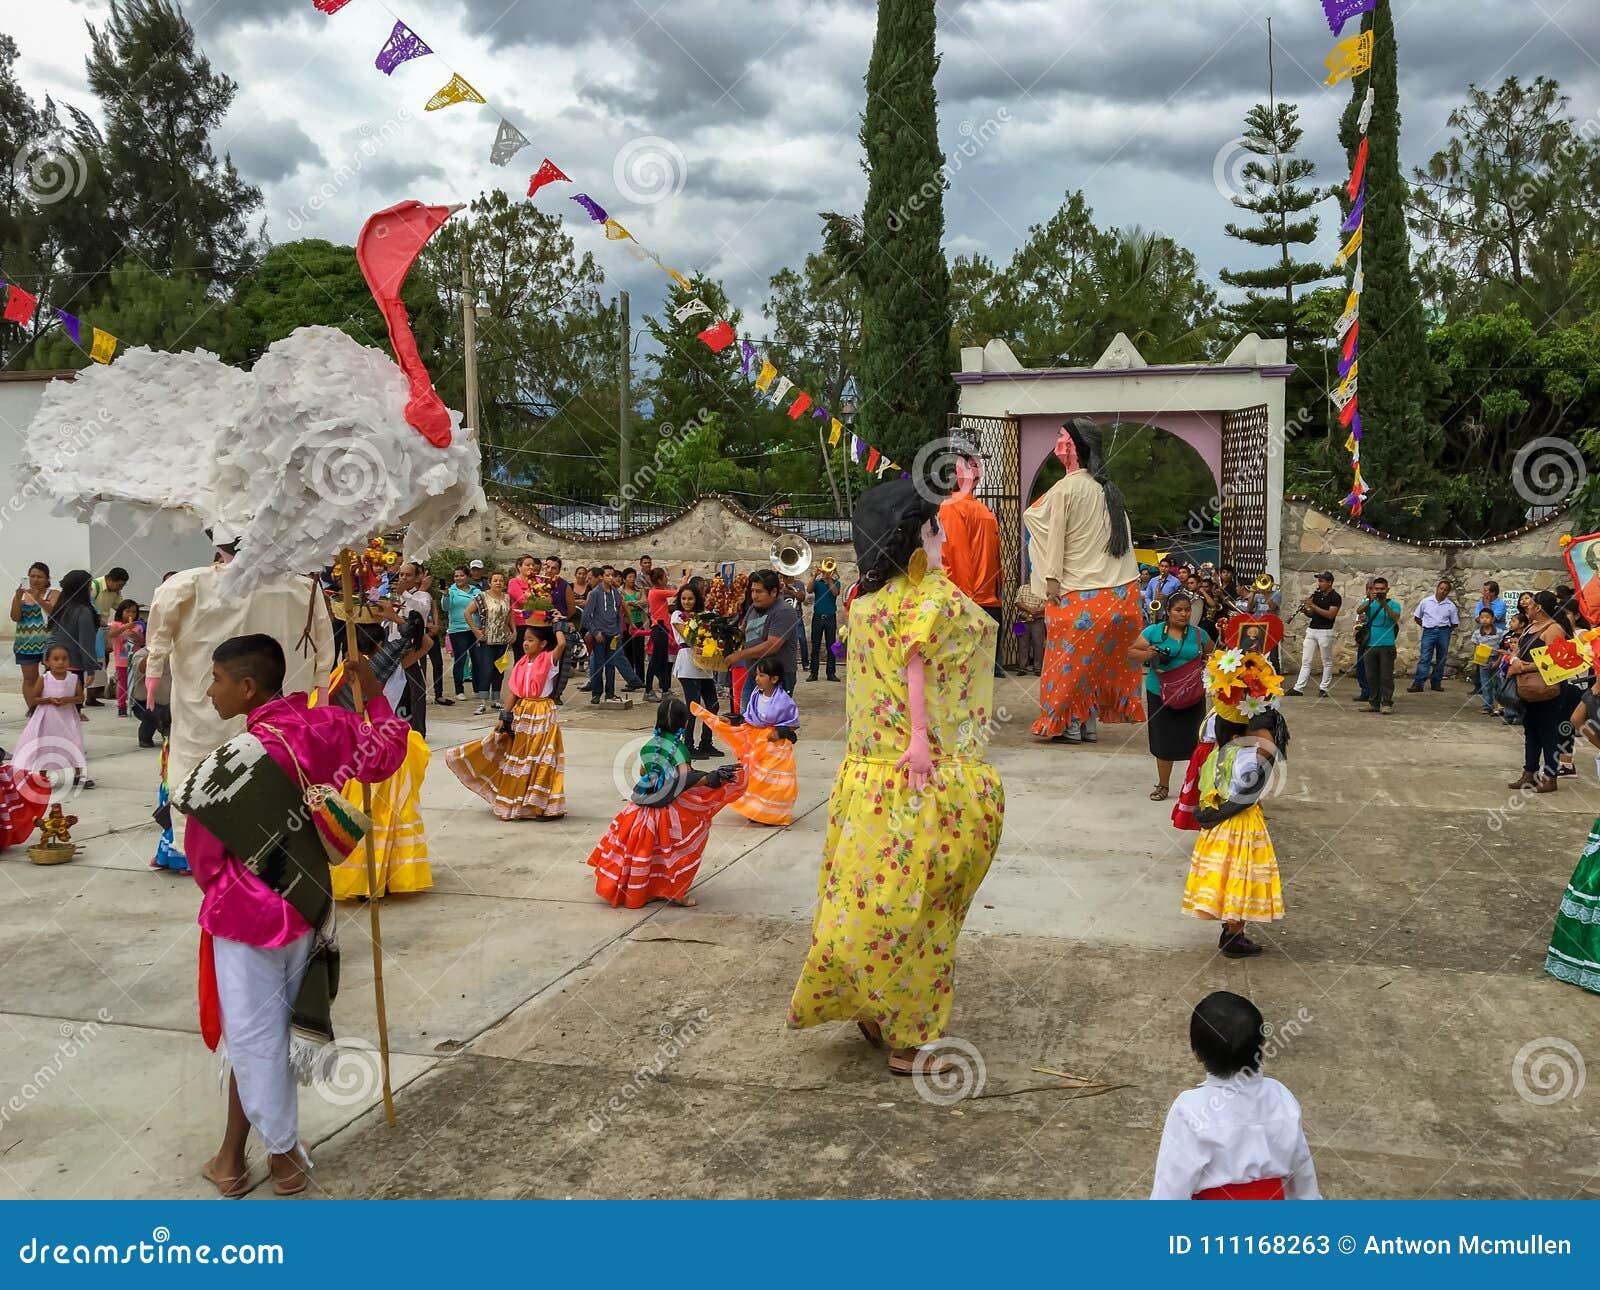 Mojigangas and children dancing at Calenda San Pedro in Oaxaca.